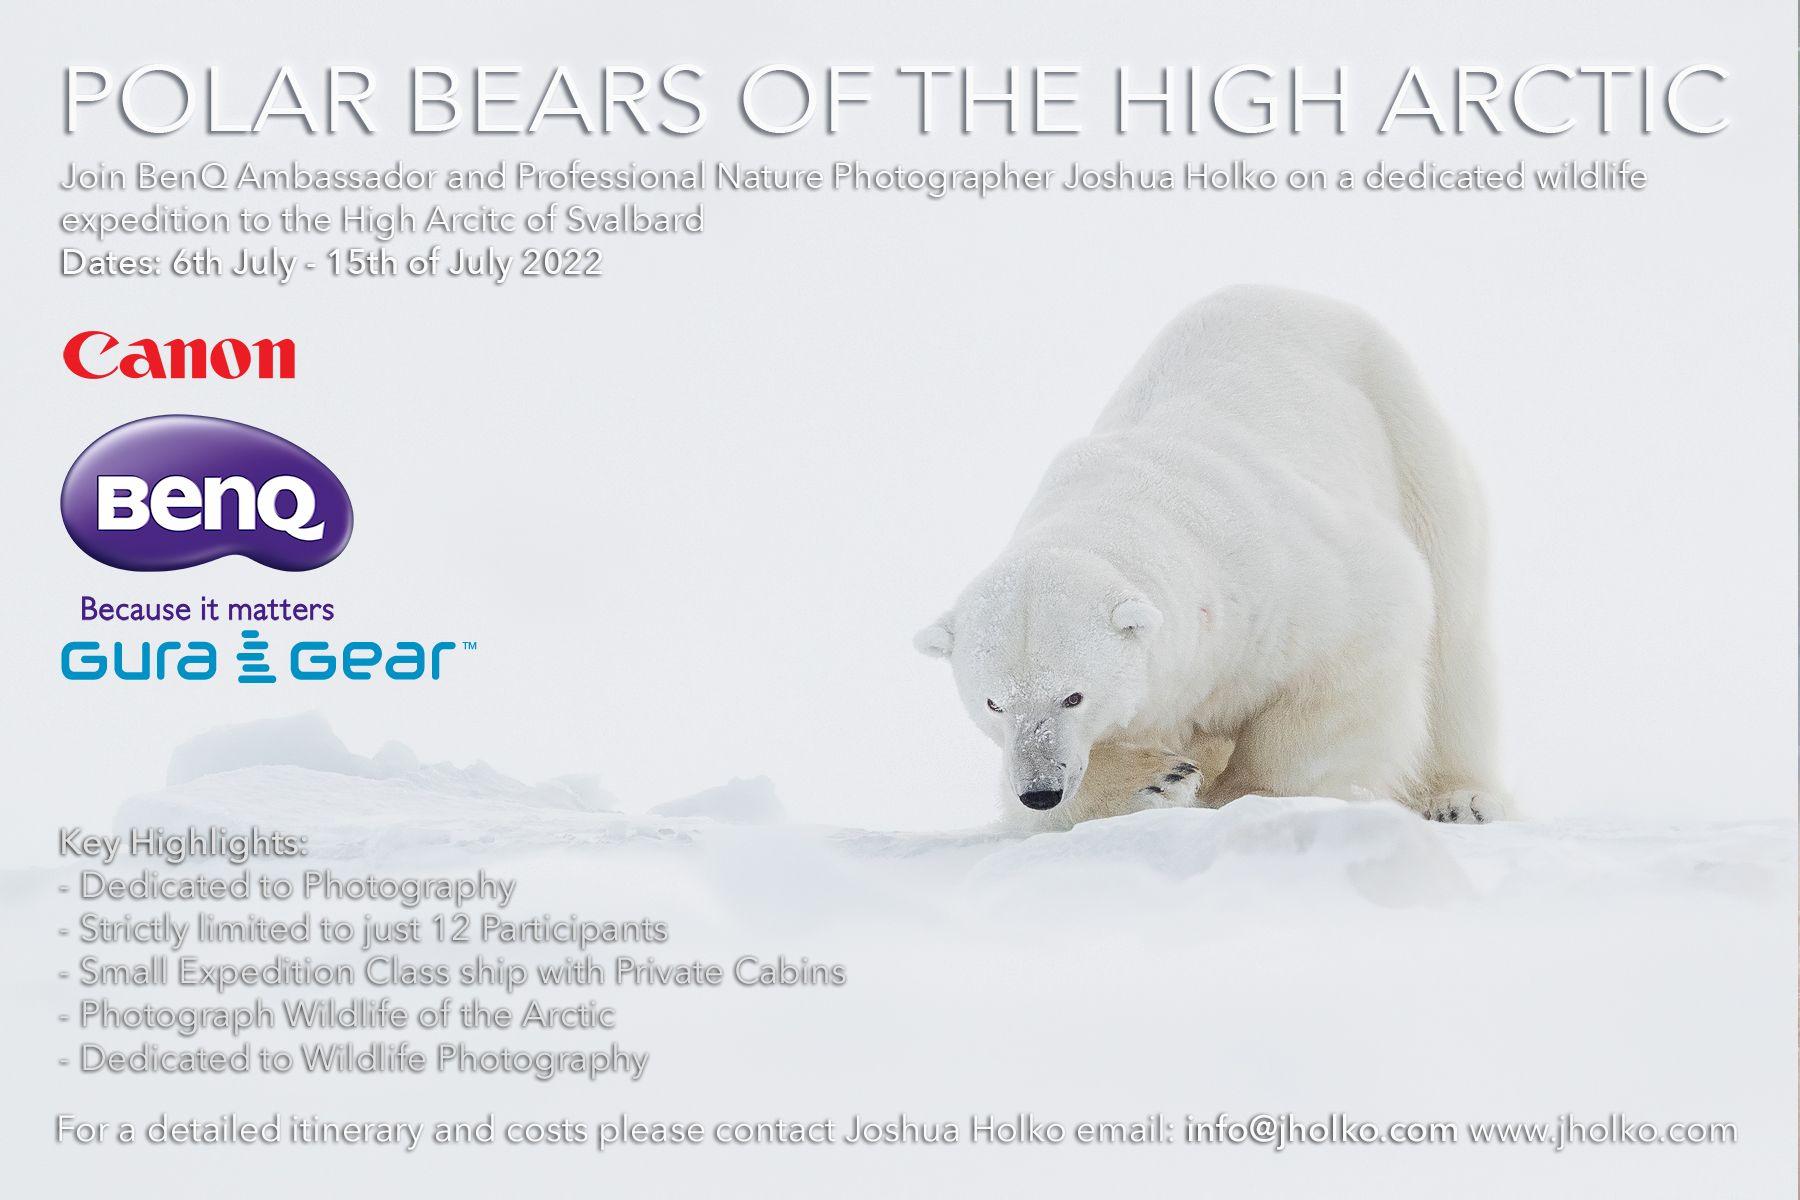 Polar Bears of the High Arctic Expedition with Joshua Holko 2022